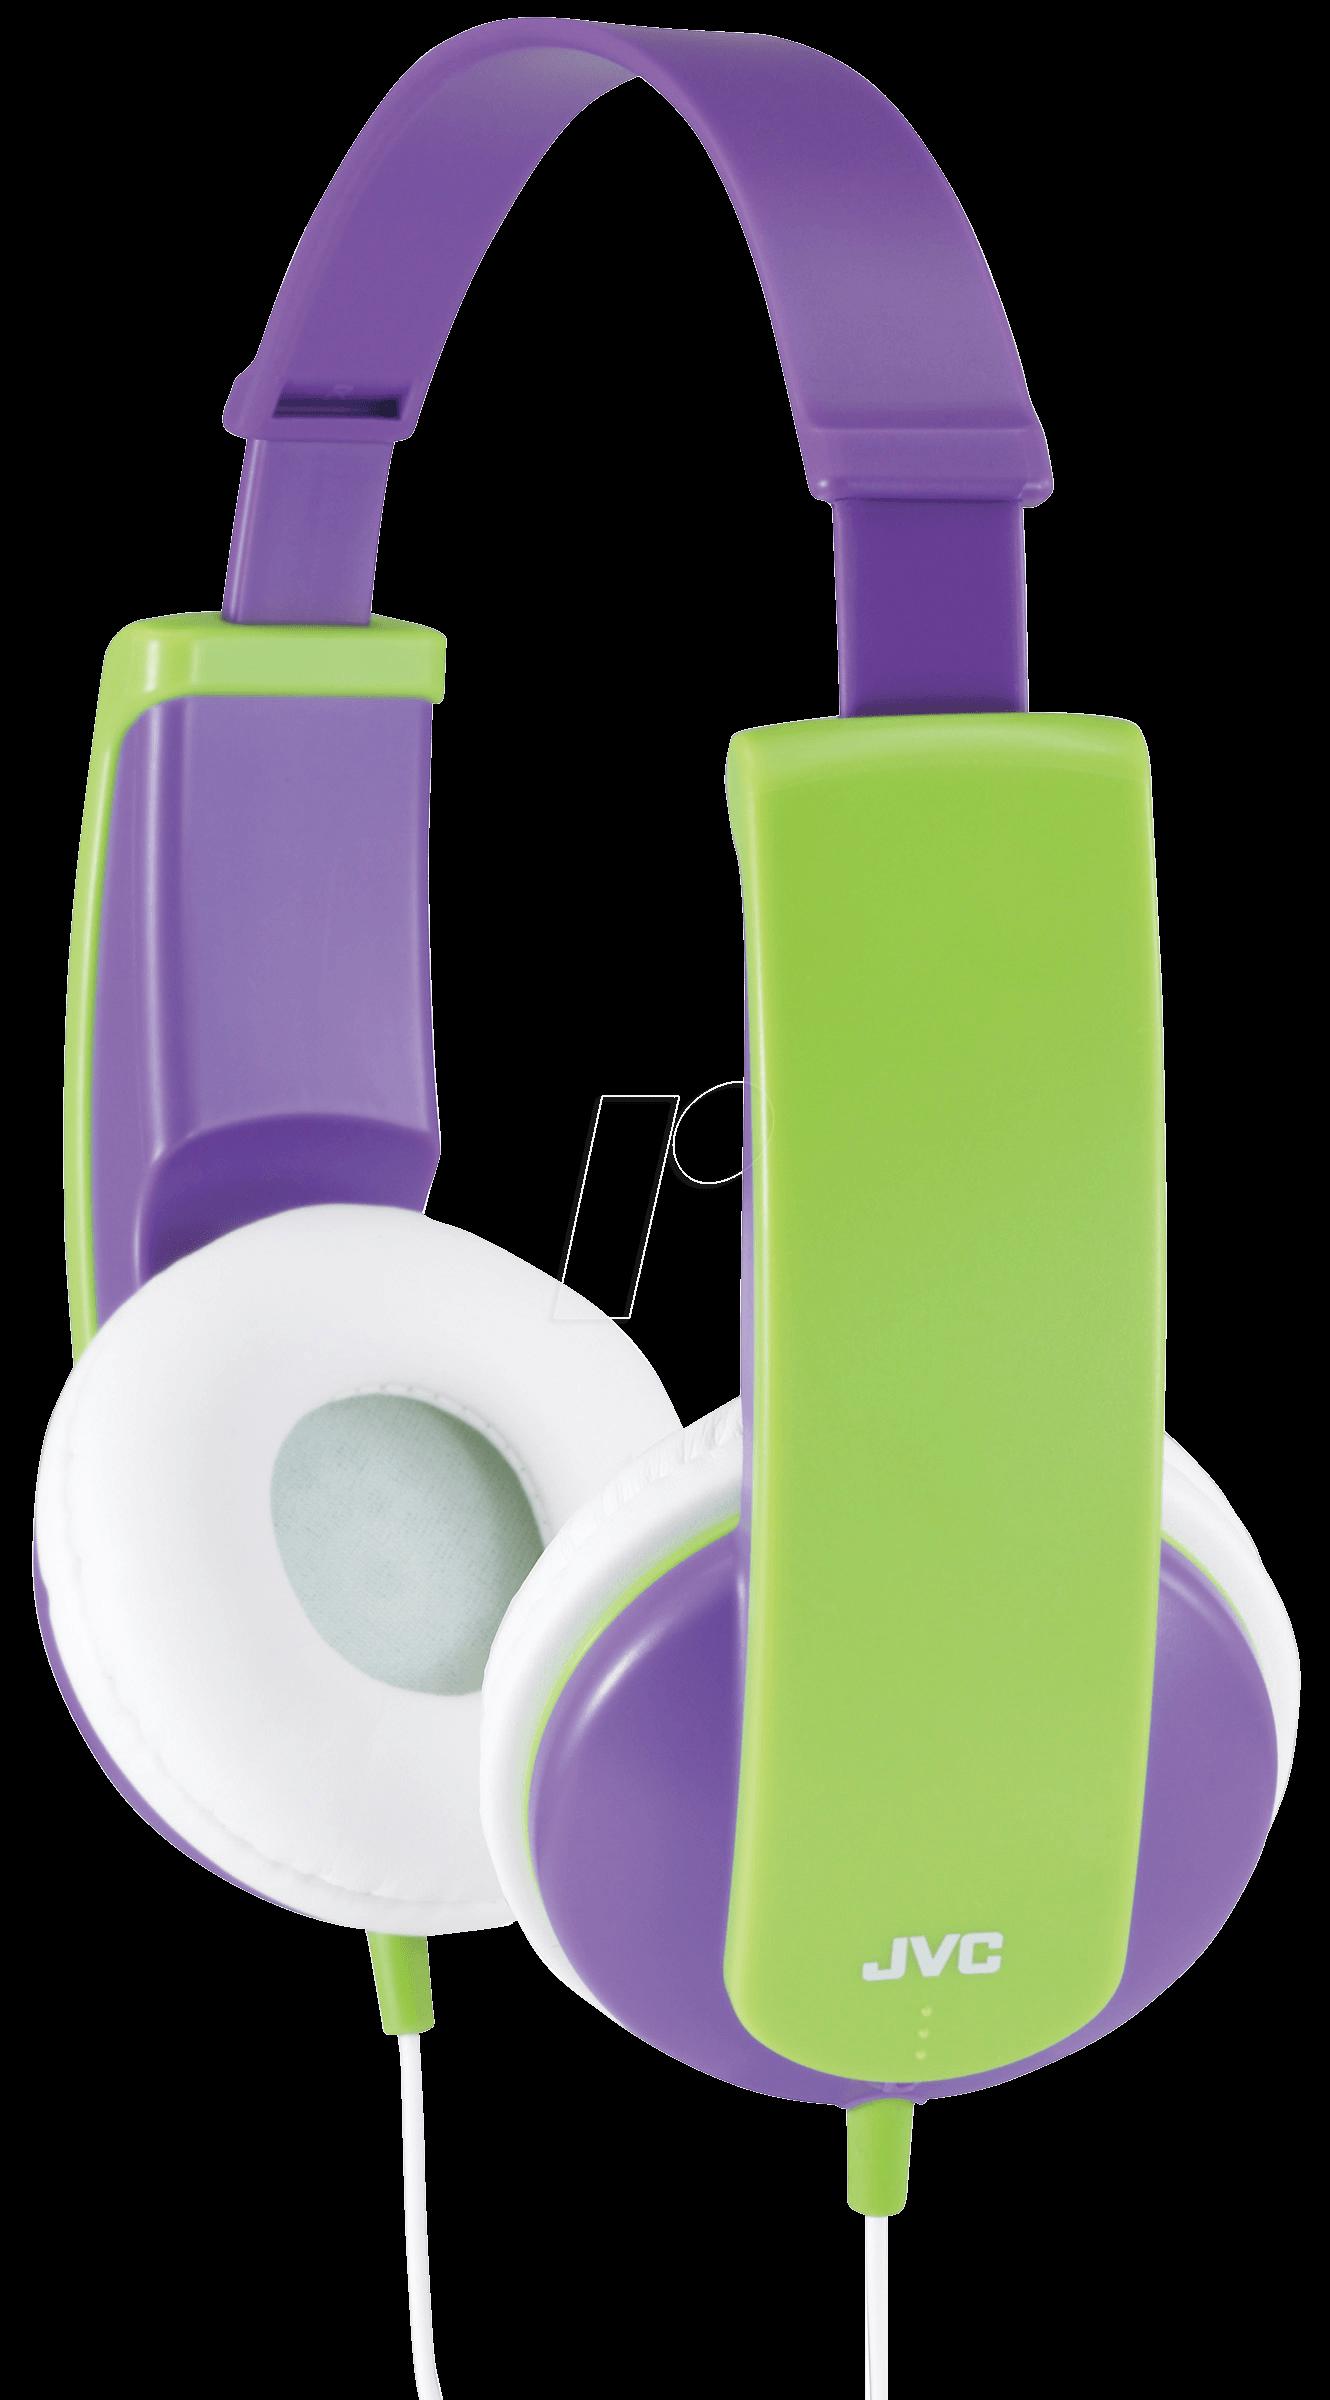 jvc ha kd5 vl kindgerechter stereokopfh rer over ear violett bei reichelt elektronik. Black Bedroom Furniture Sets. Home Design Ideas